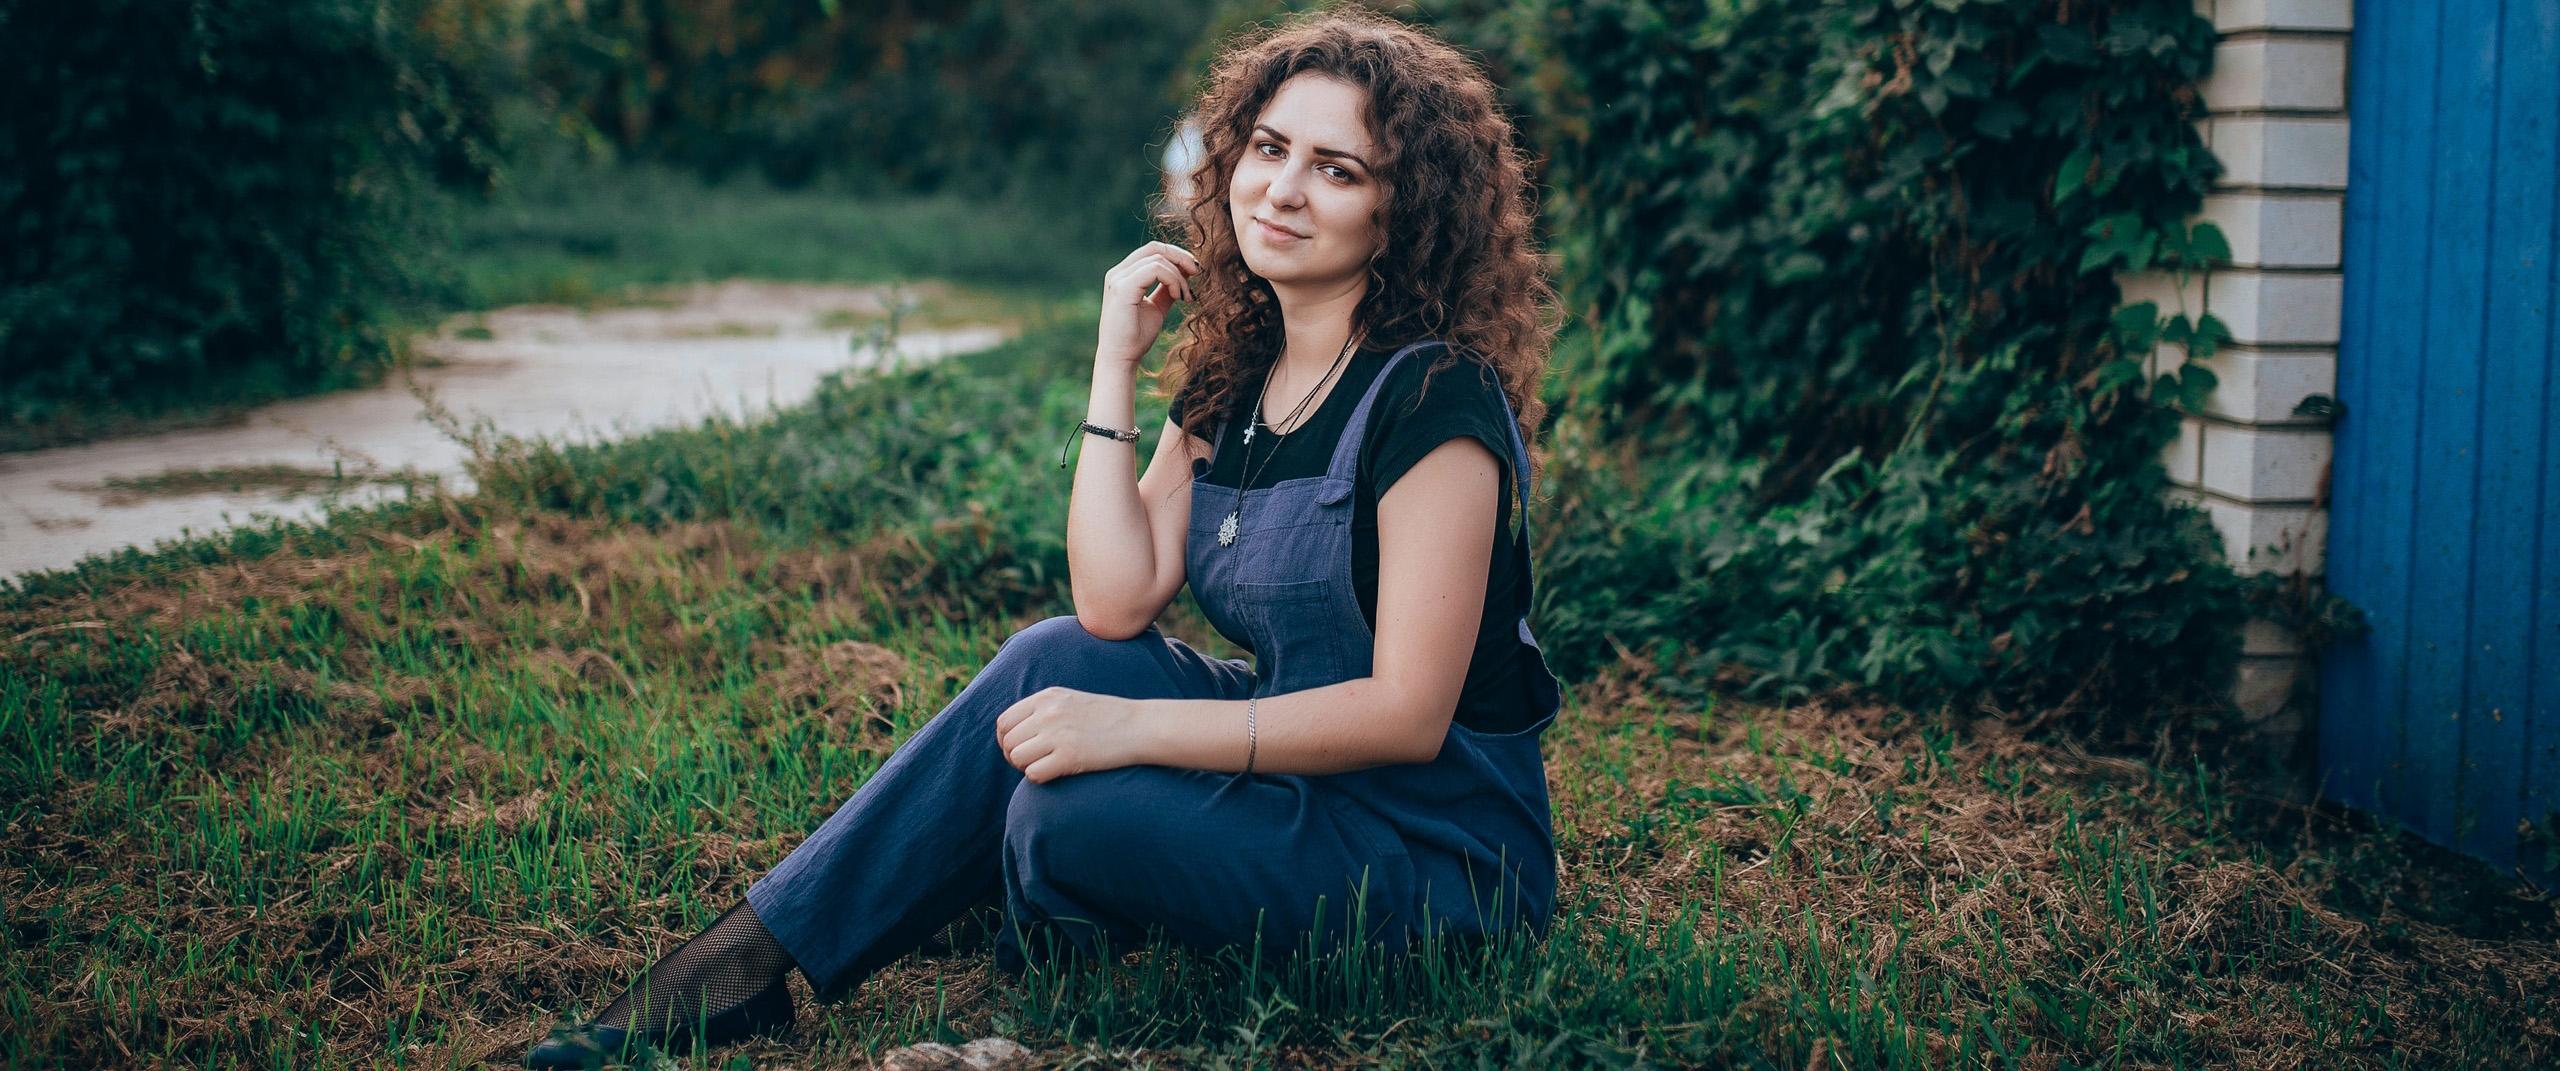 Маргарита СИДОРОВА, персонажи, thumb